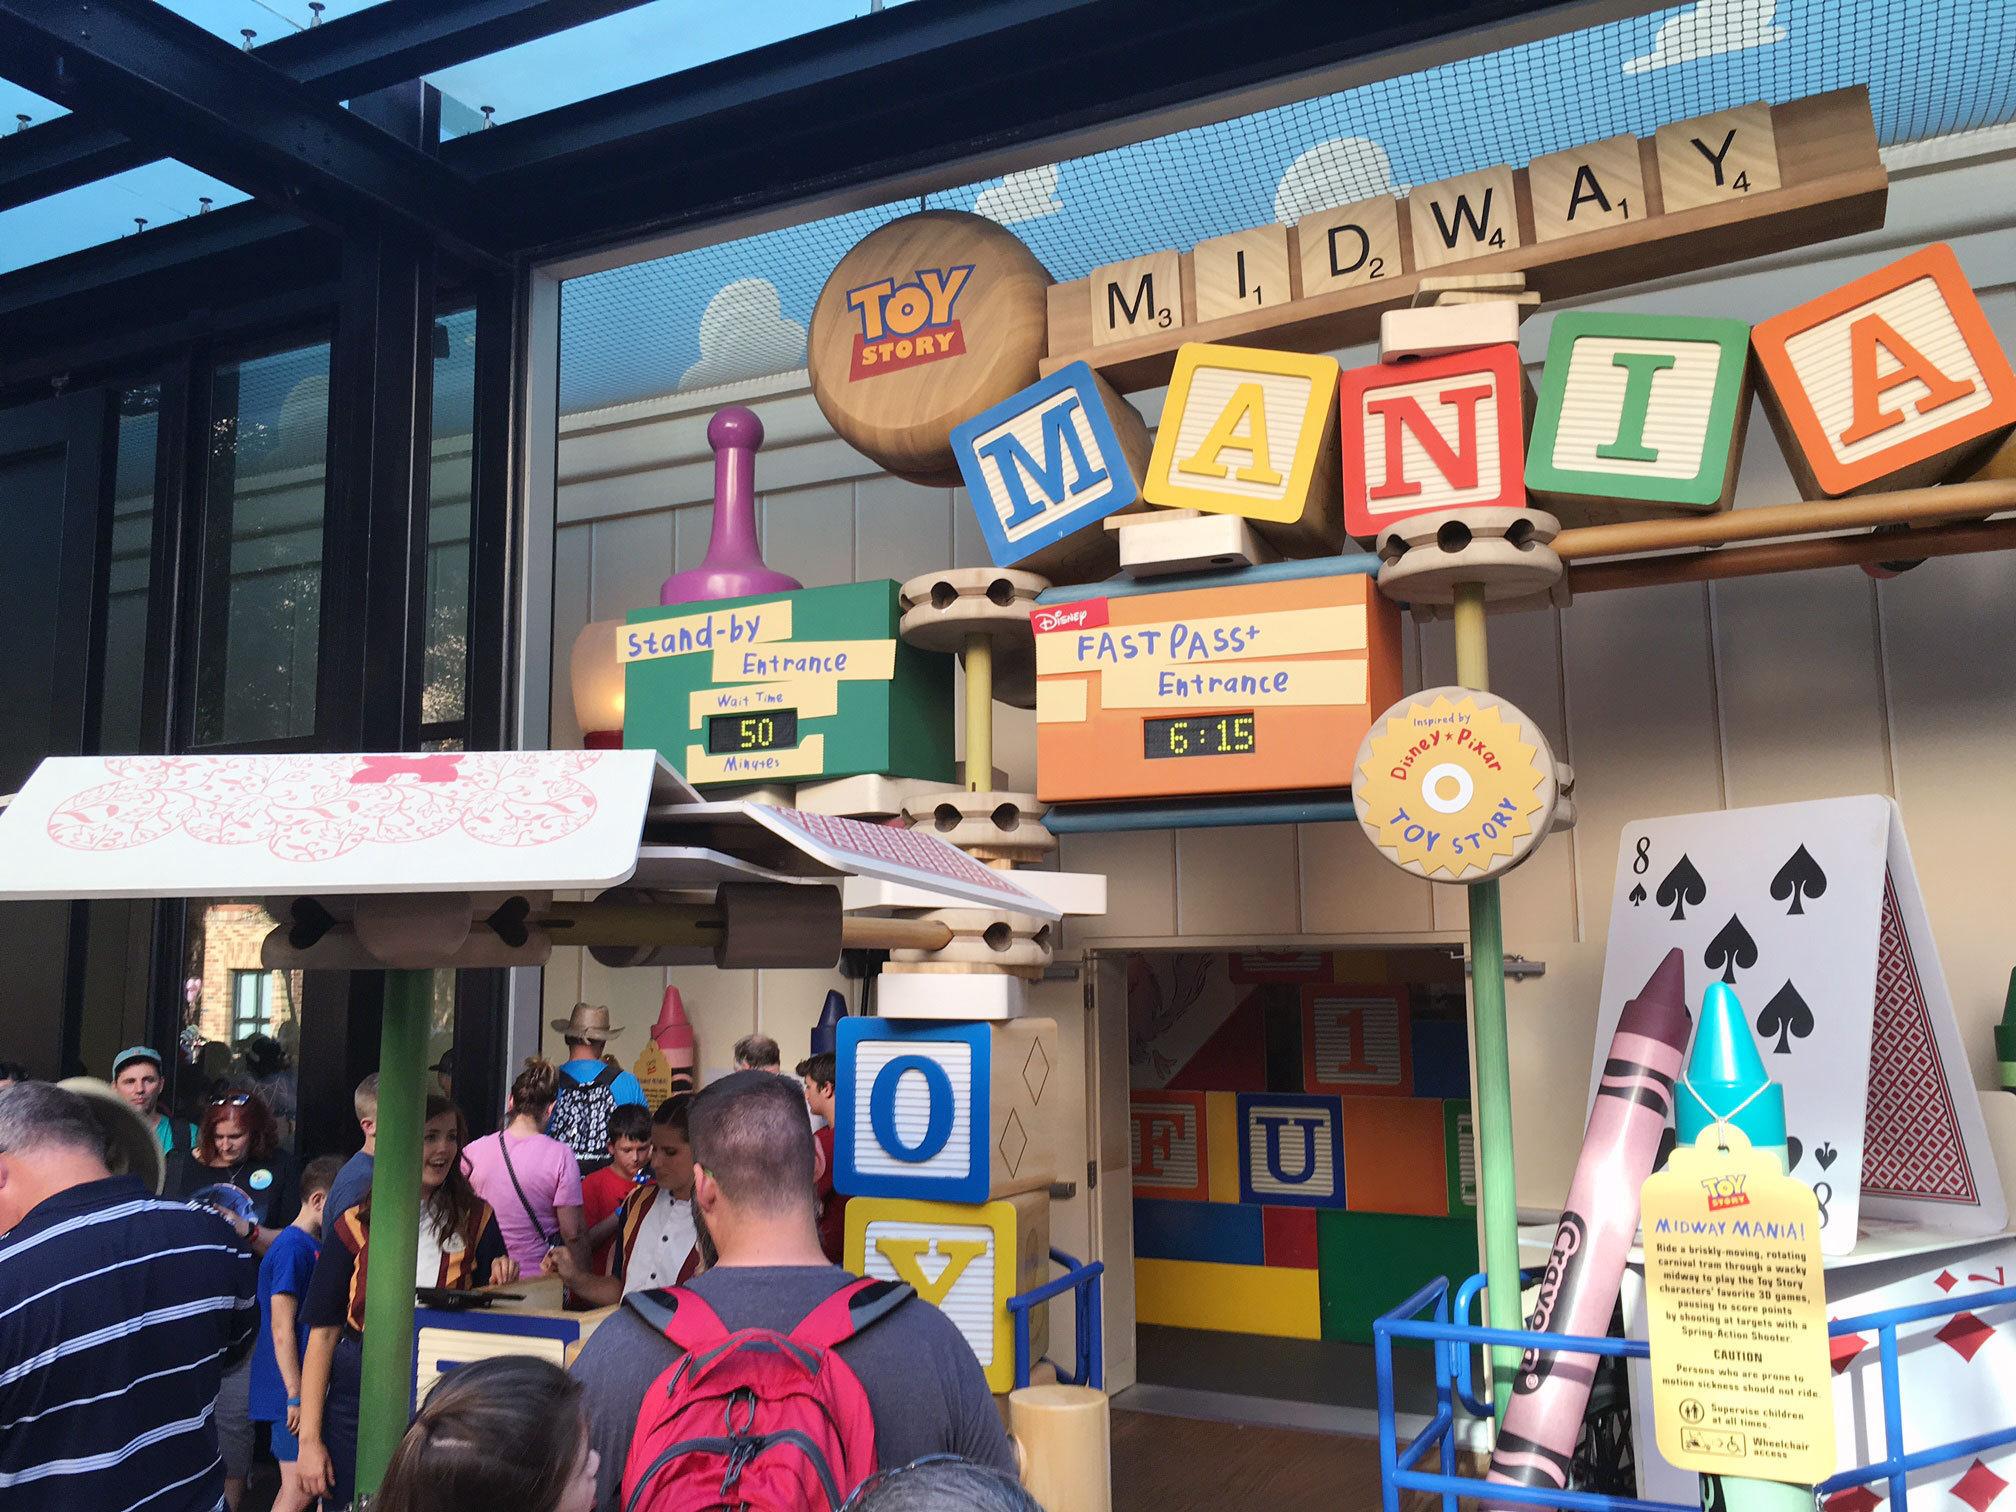 Toy Story Mania Expansion Alleviates Longest Waits Improves Tech